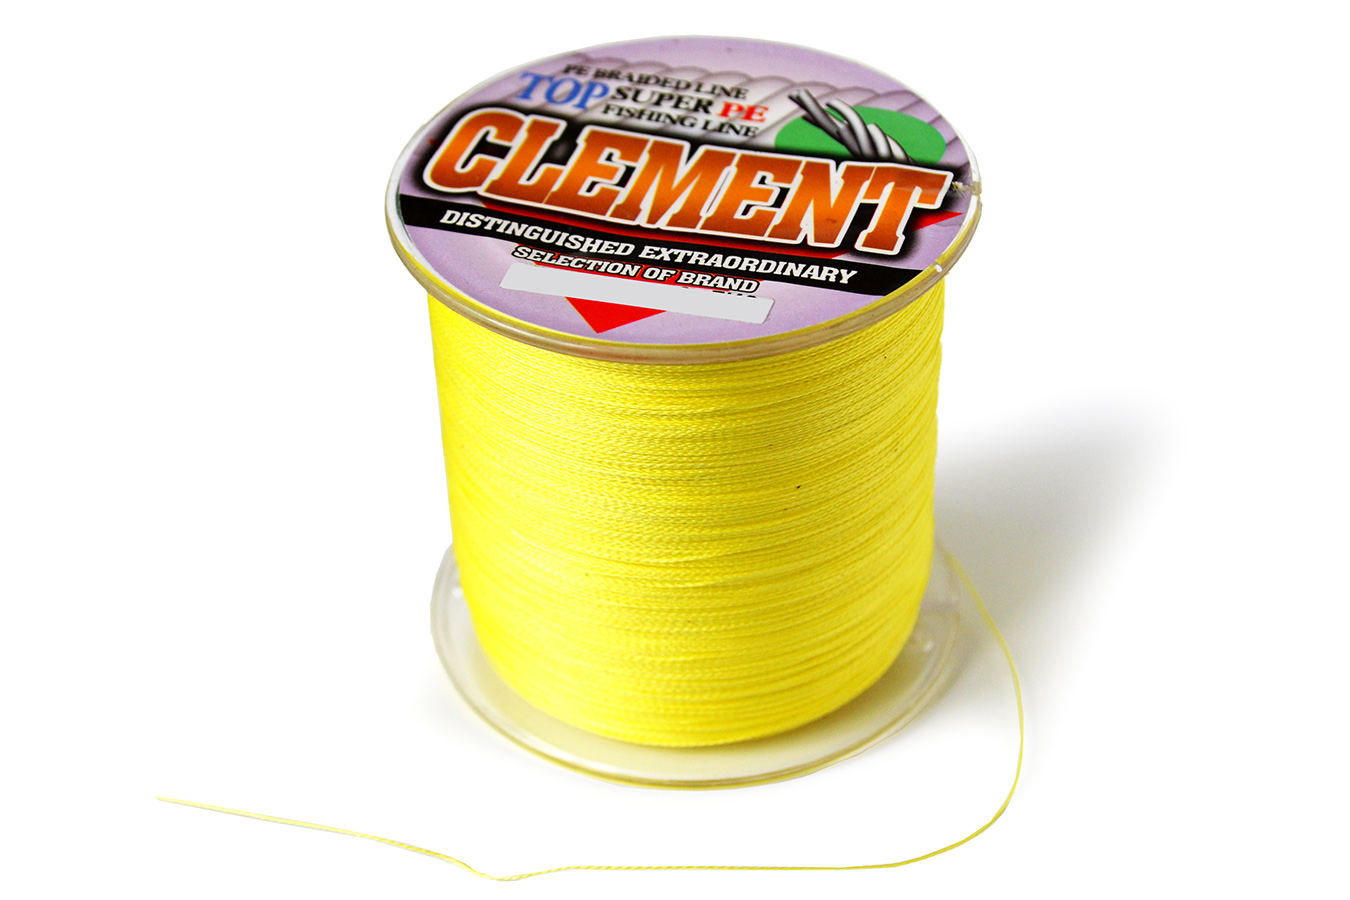 Плетеный шнур Clement Super PE 2# 12.7 кг, 500 м [SPE2127500]